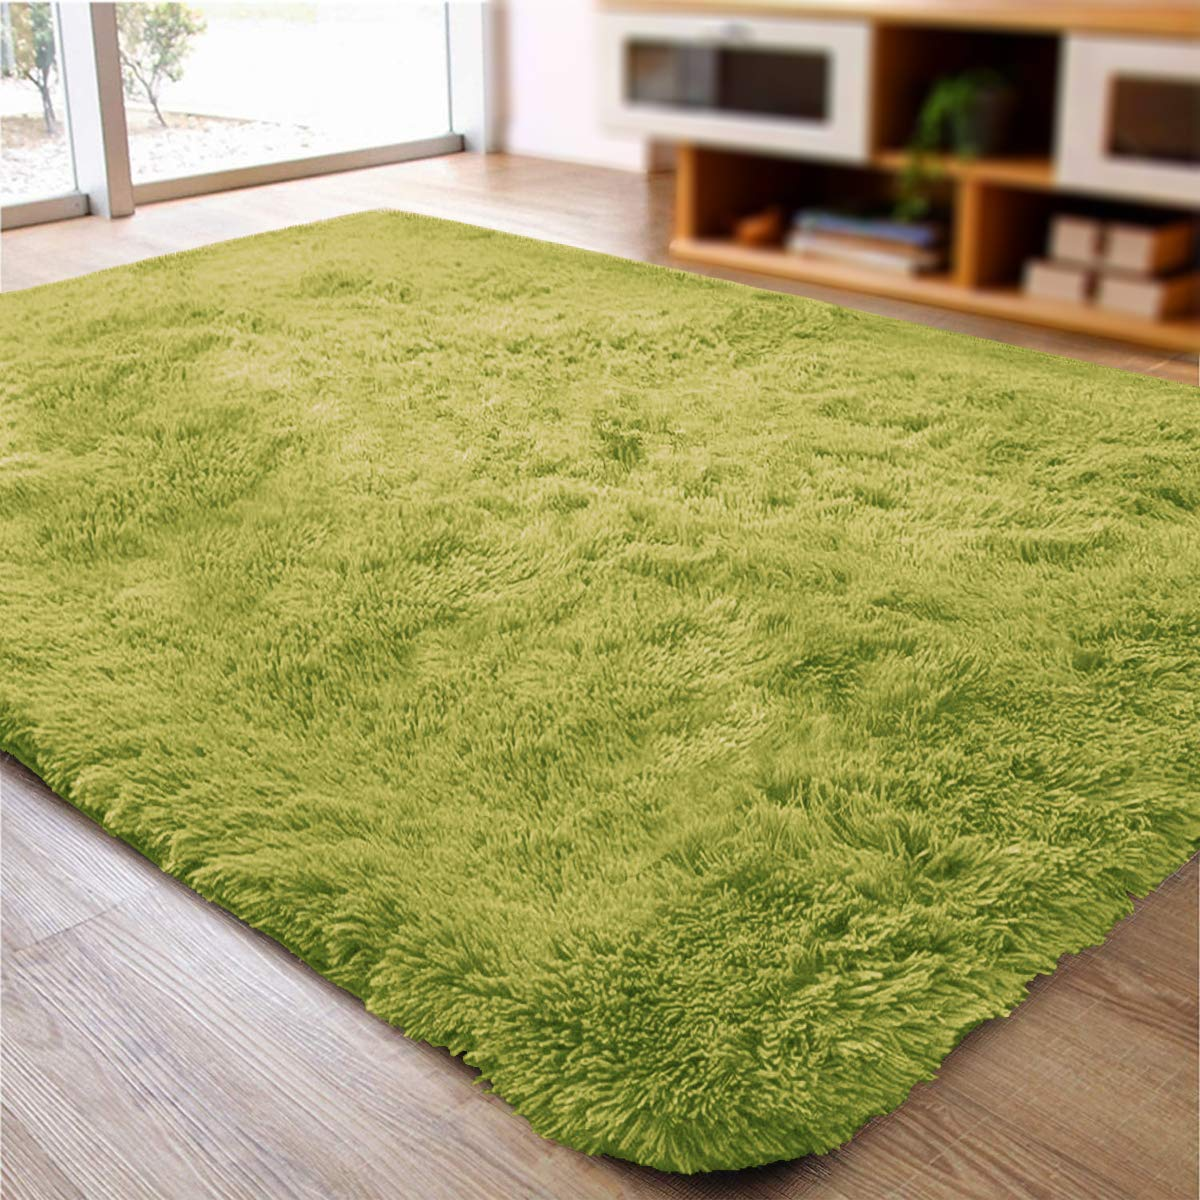 ACTCUT Super Soft Indoor Modern Shag Area Silky Smooth Fur Rugs Fluffy Rugs Anti-Skid Shaggy Area Rug Dining Room Home Bedroom Carpet Floor Mat 2.5 Feet X 5 Feet (Green)